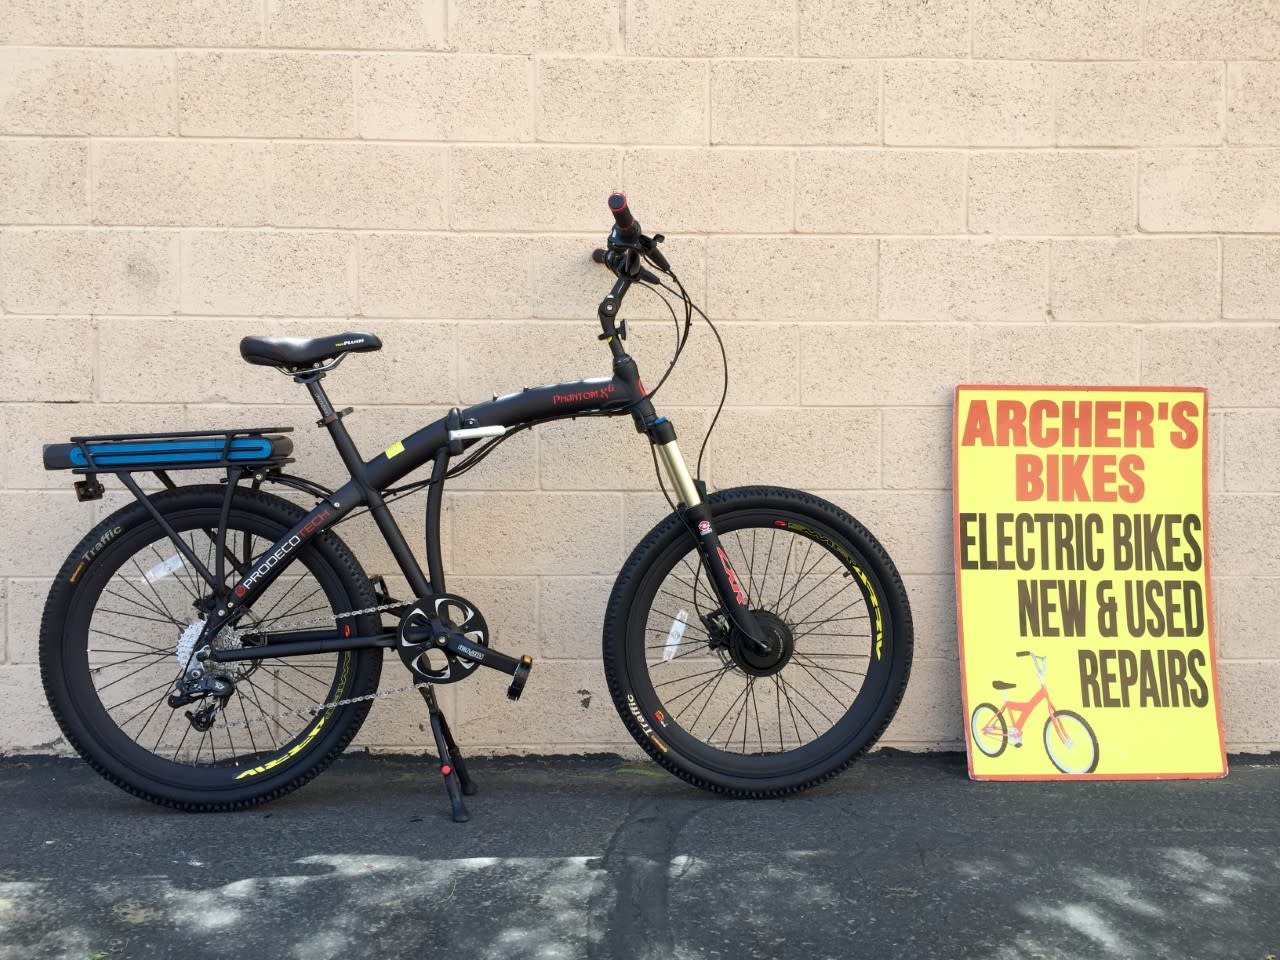 574eef3eac6 Prodeco Phantom Xii Electric Bike (used) - Archer's Bikes   Mesa, AZ